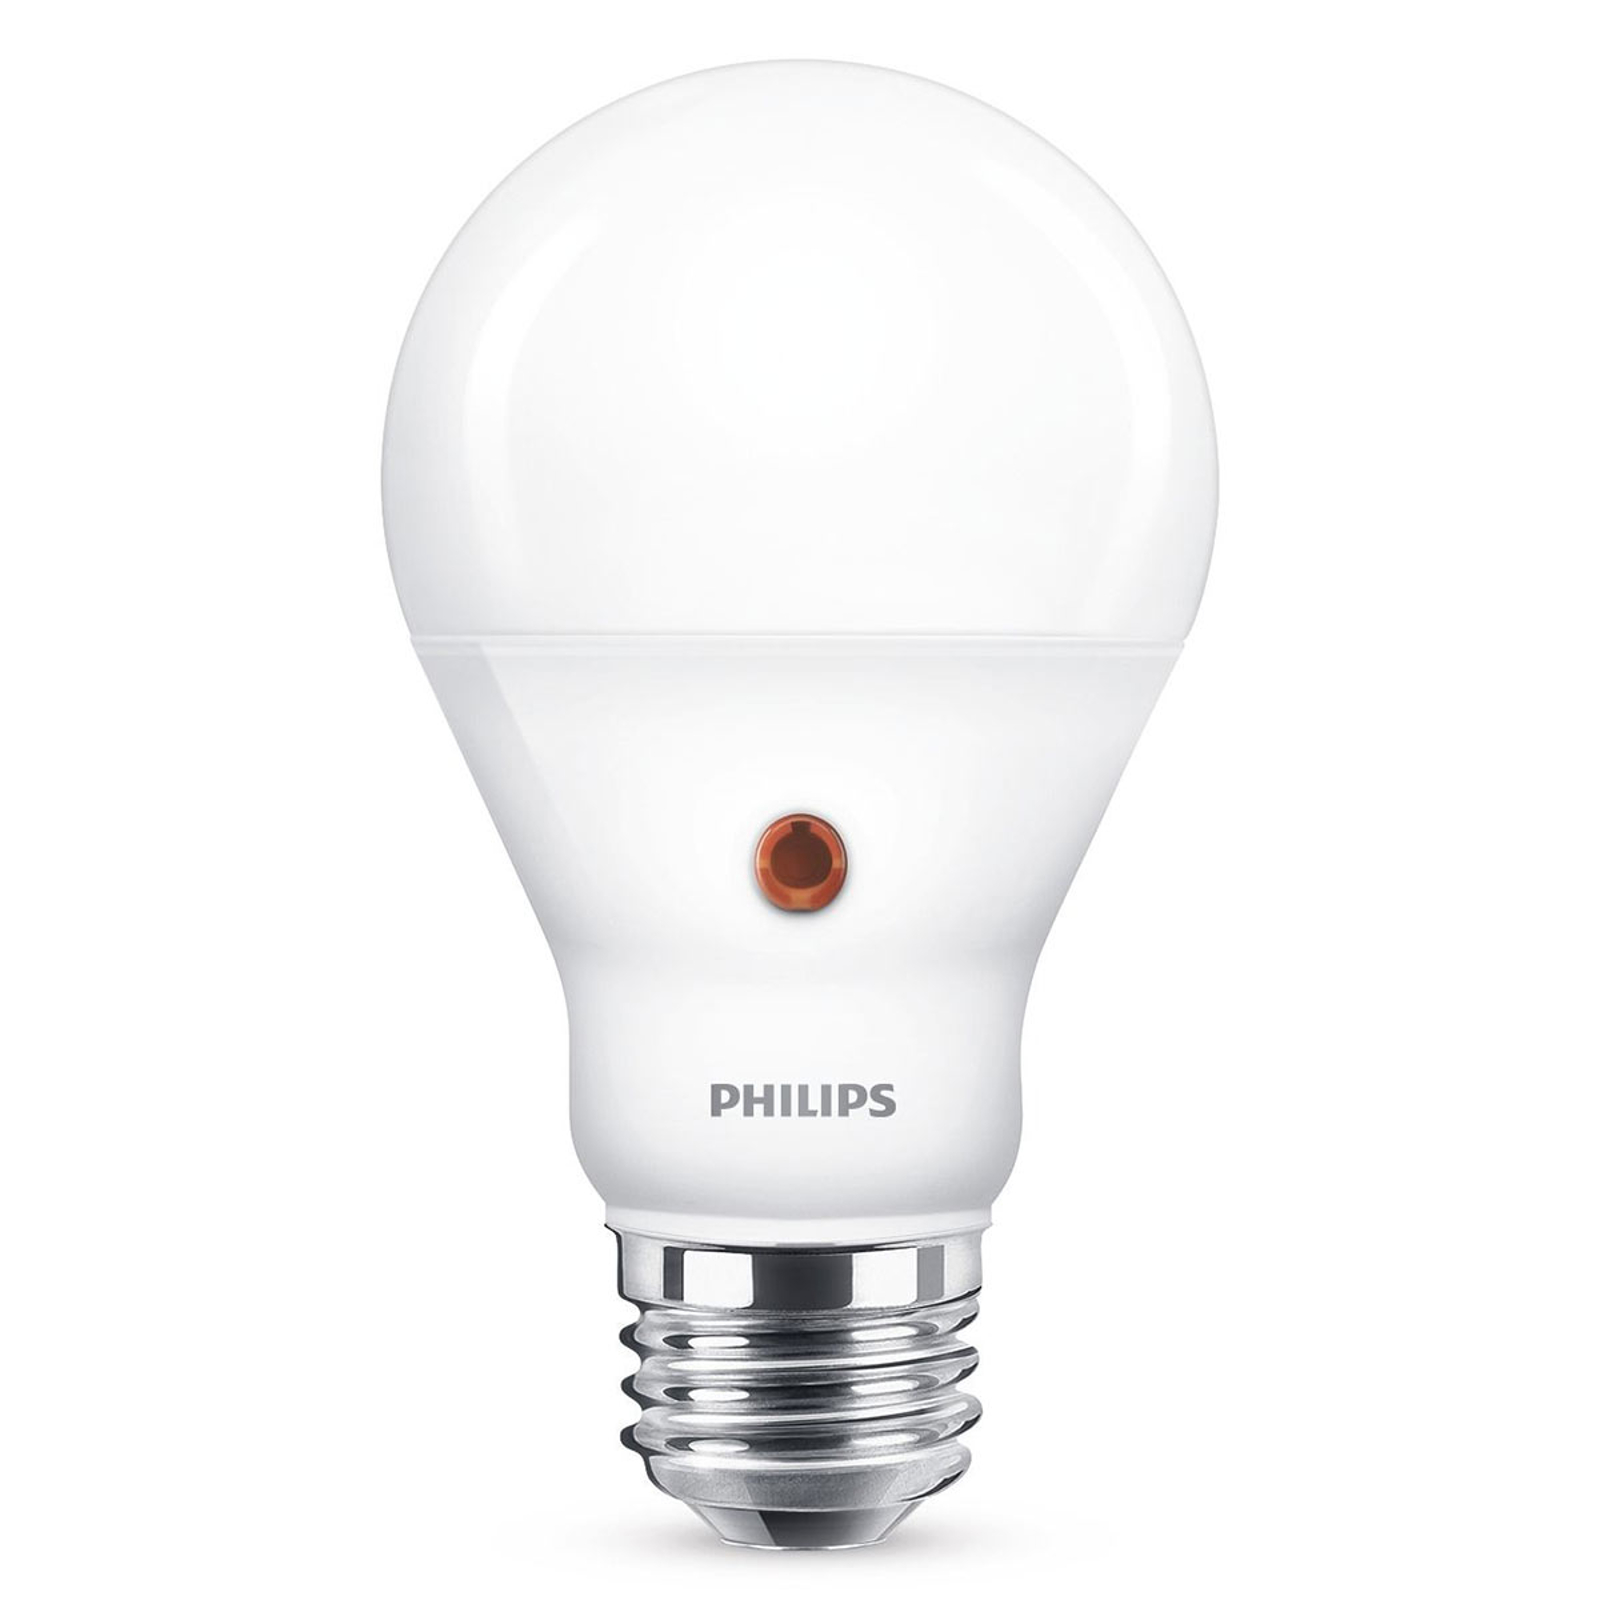 E27 A19 LED-lampa dag/natt-sensor 7,5 W, 2700 K